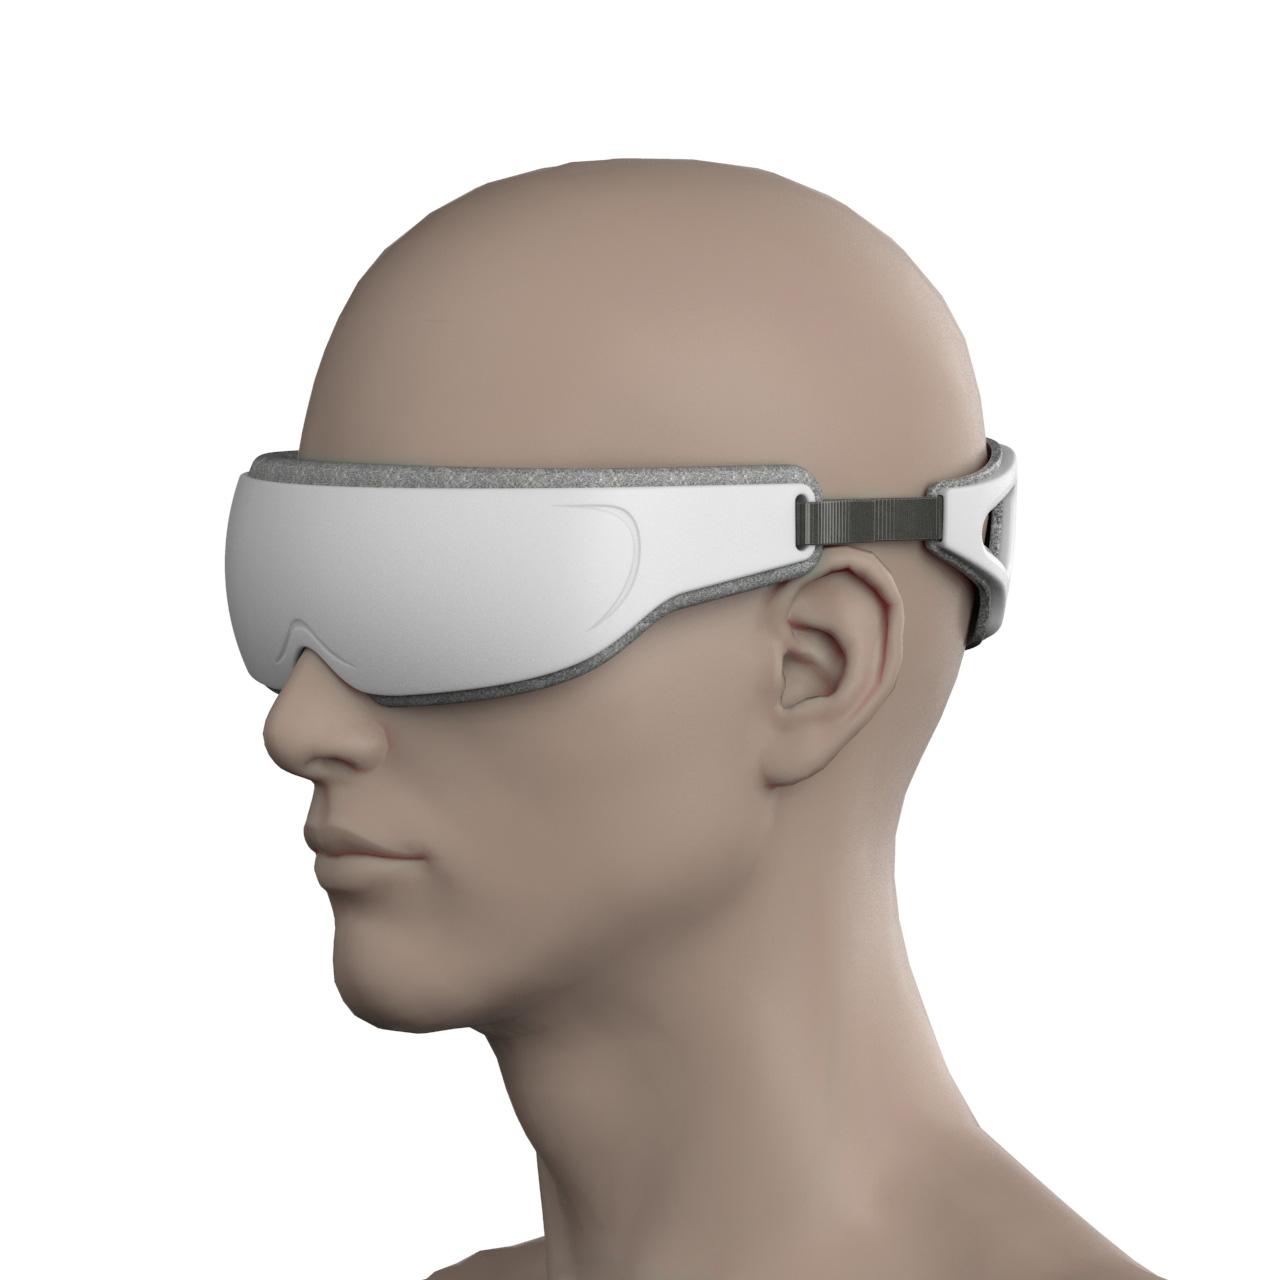 cohen_headset c1.2303.jpg